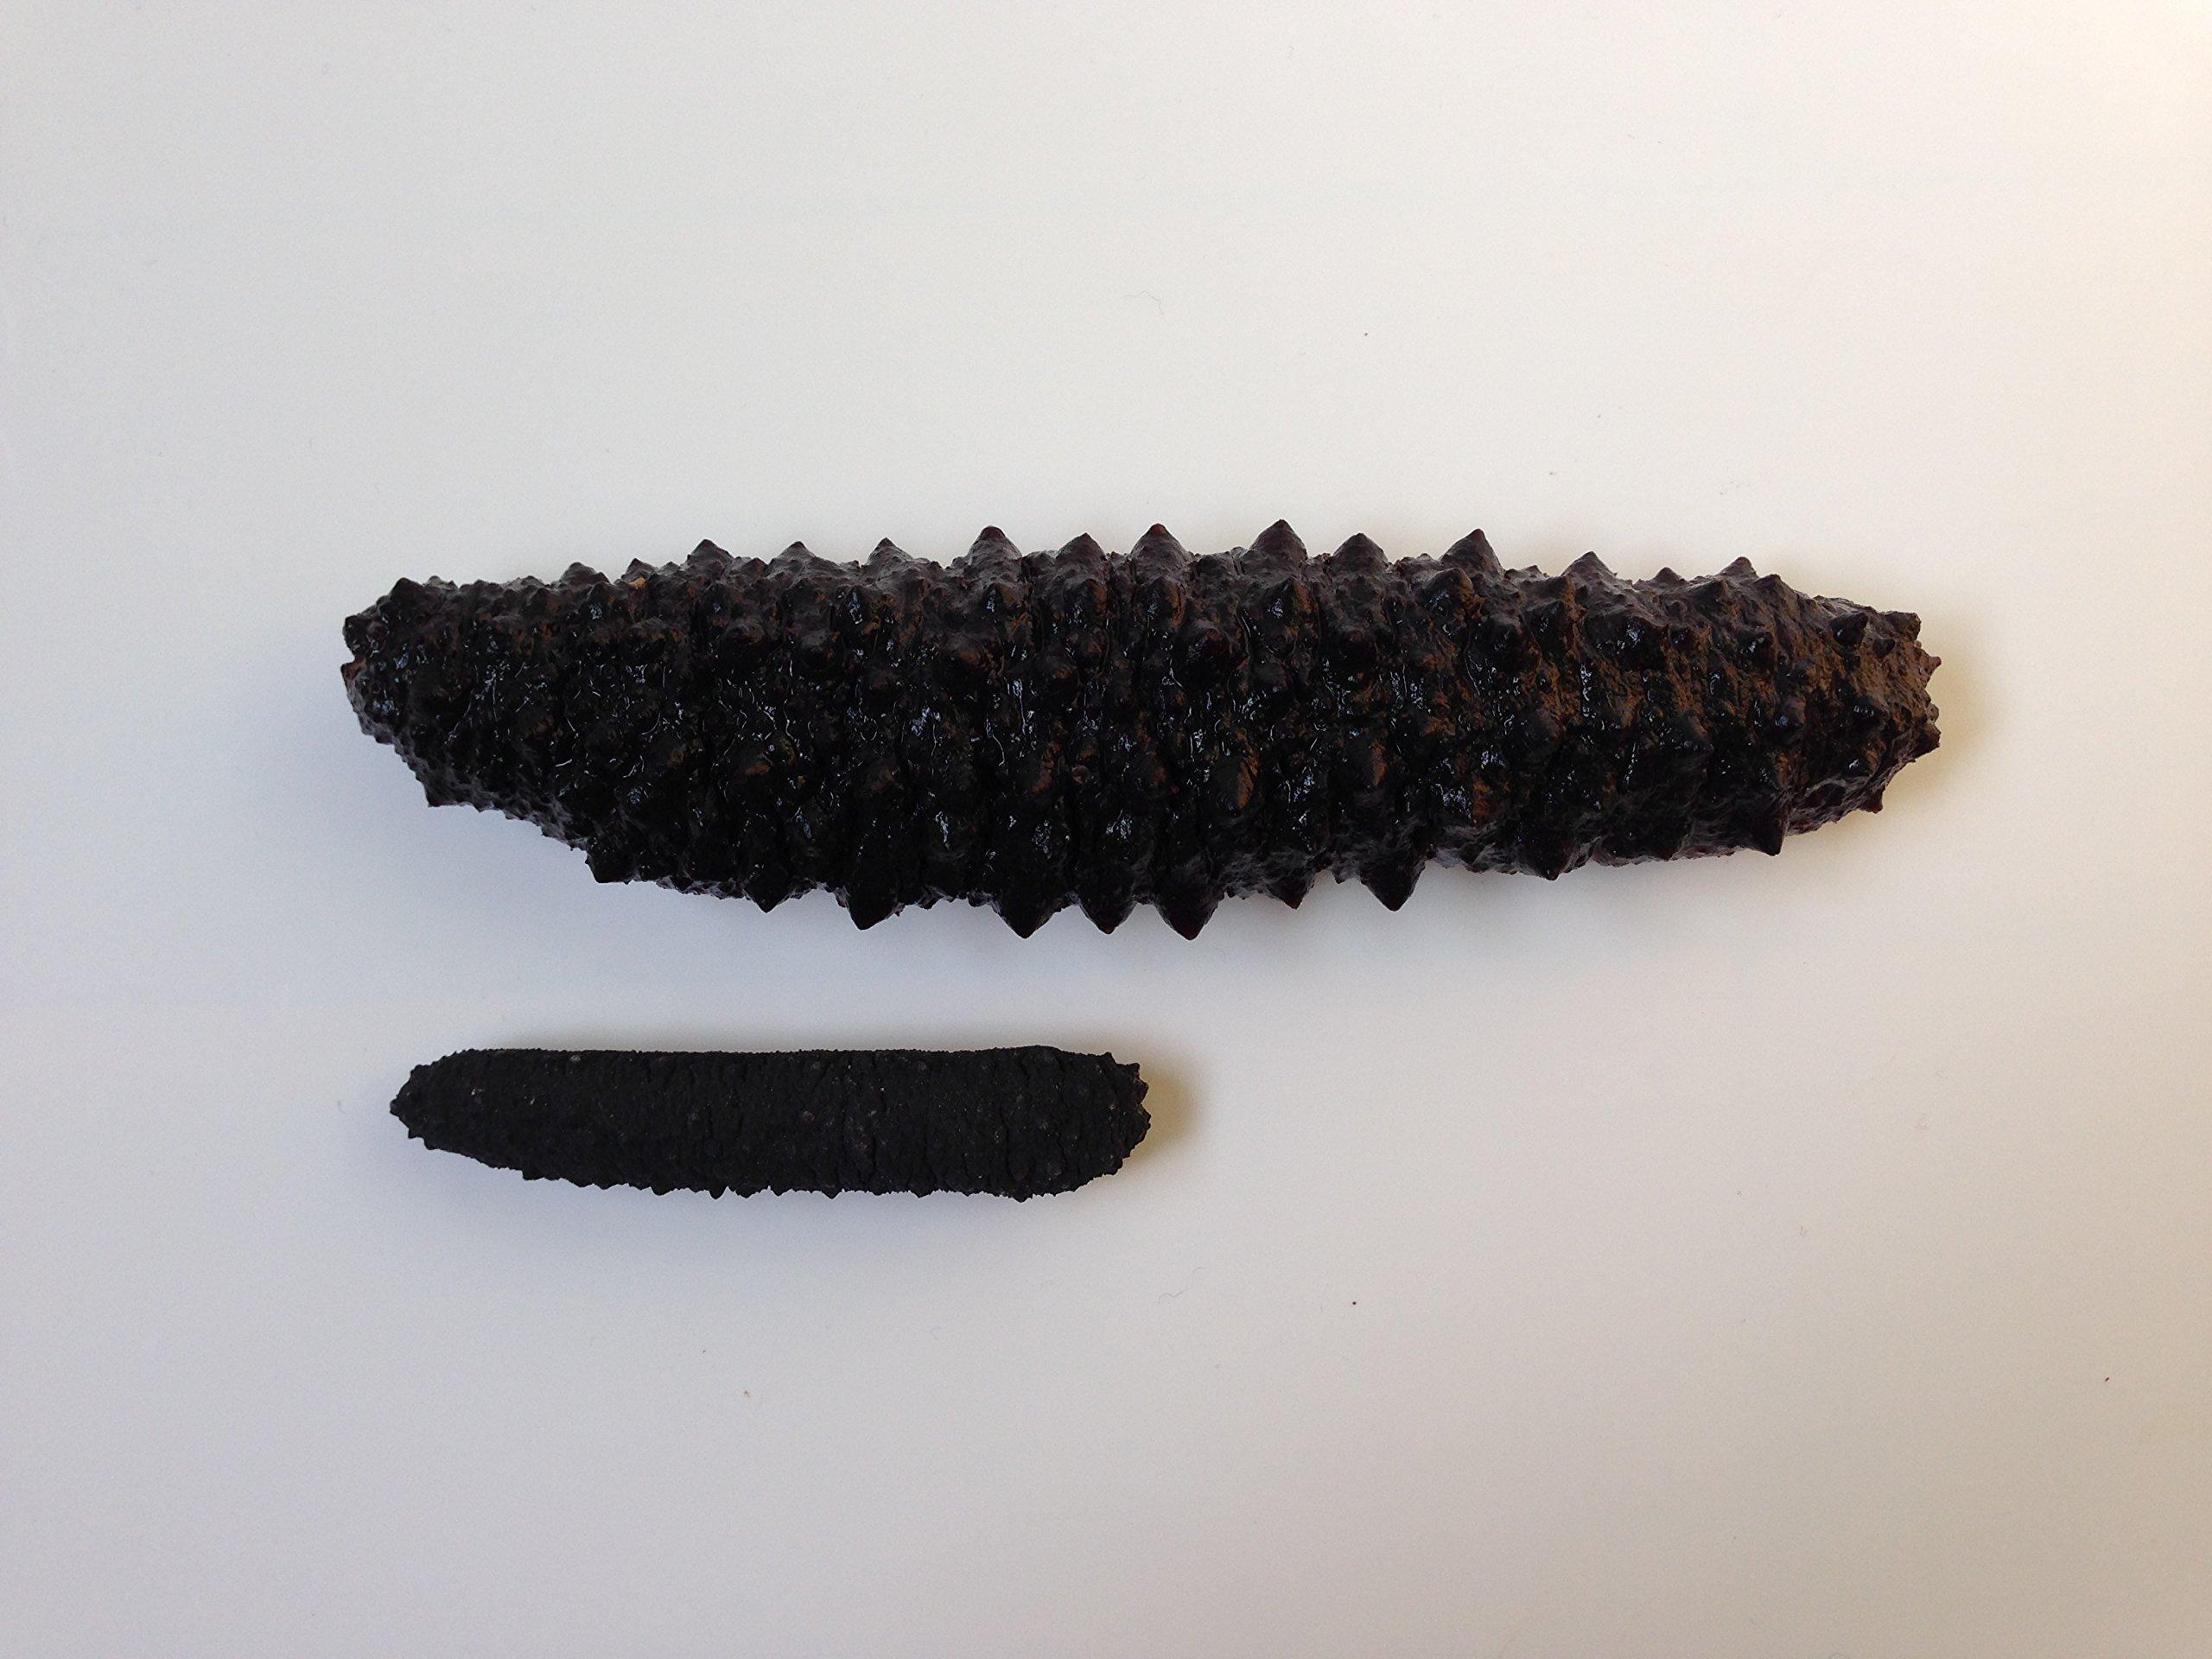 海参天下 Wild Black pin Atlantic Dried Sea cucumber 8oz pack (60-90pcs #5)大西洋岩刺参 8oz(60-90头,5号) by Sea Cucumber Inc (Image #4)